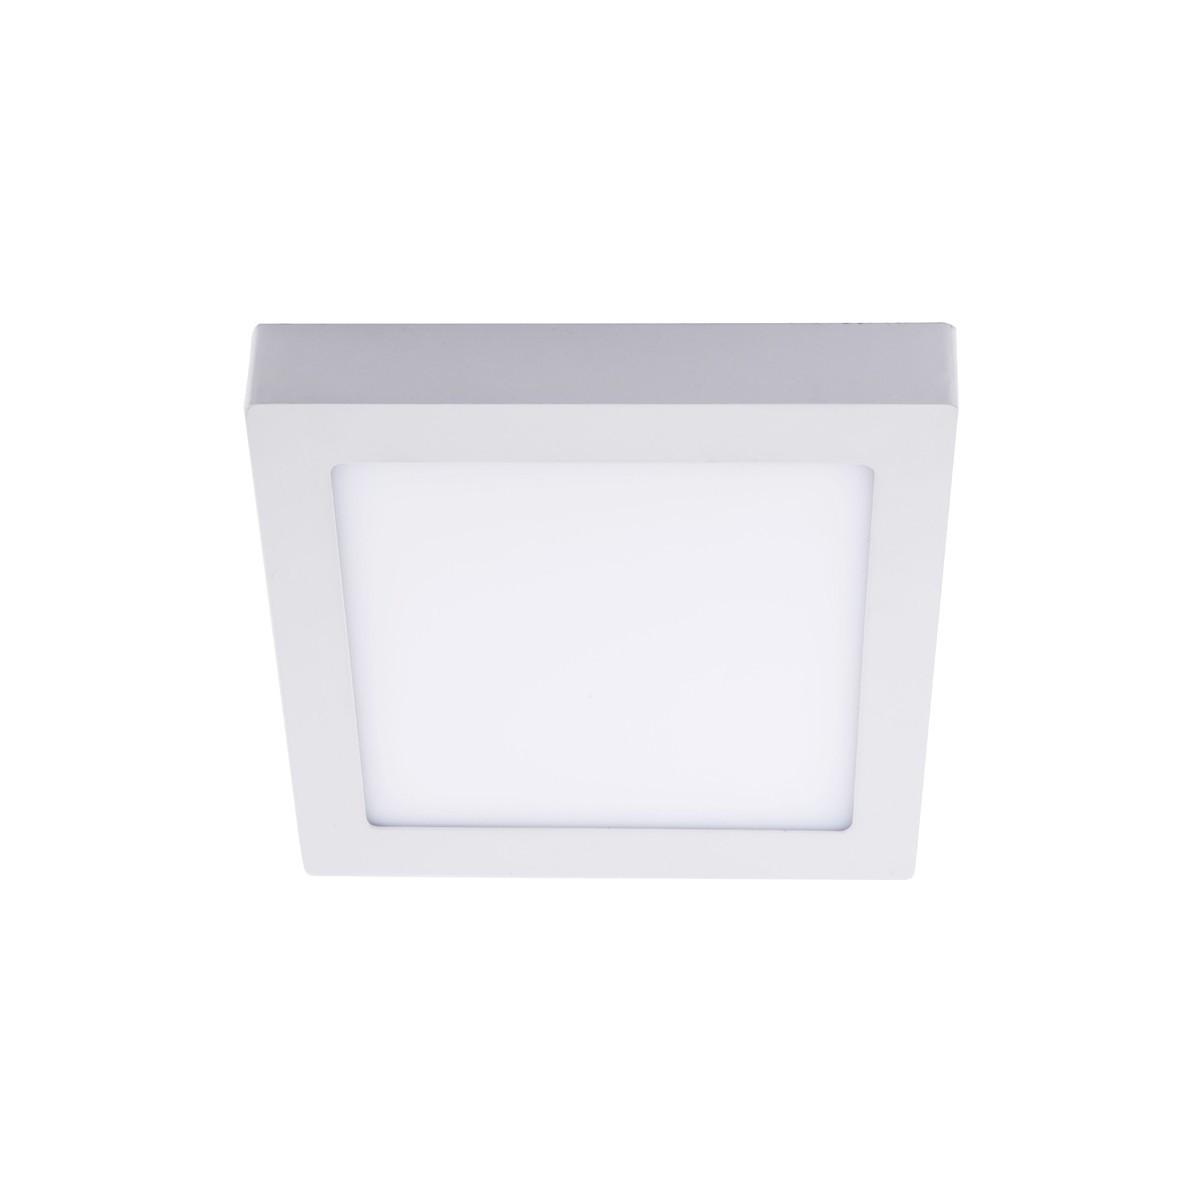 Plafon LED 6W 4000K Know cuadrado blanco